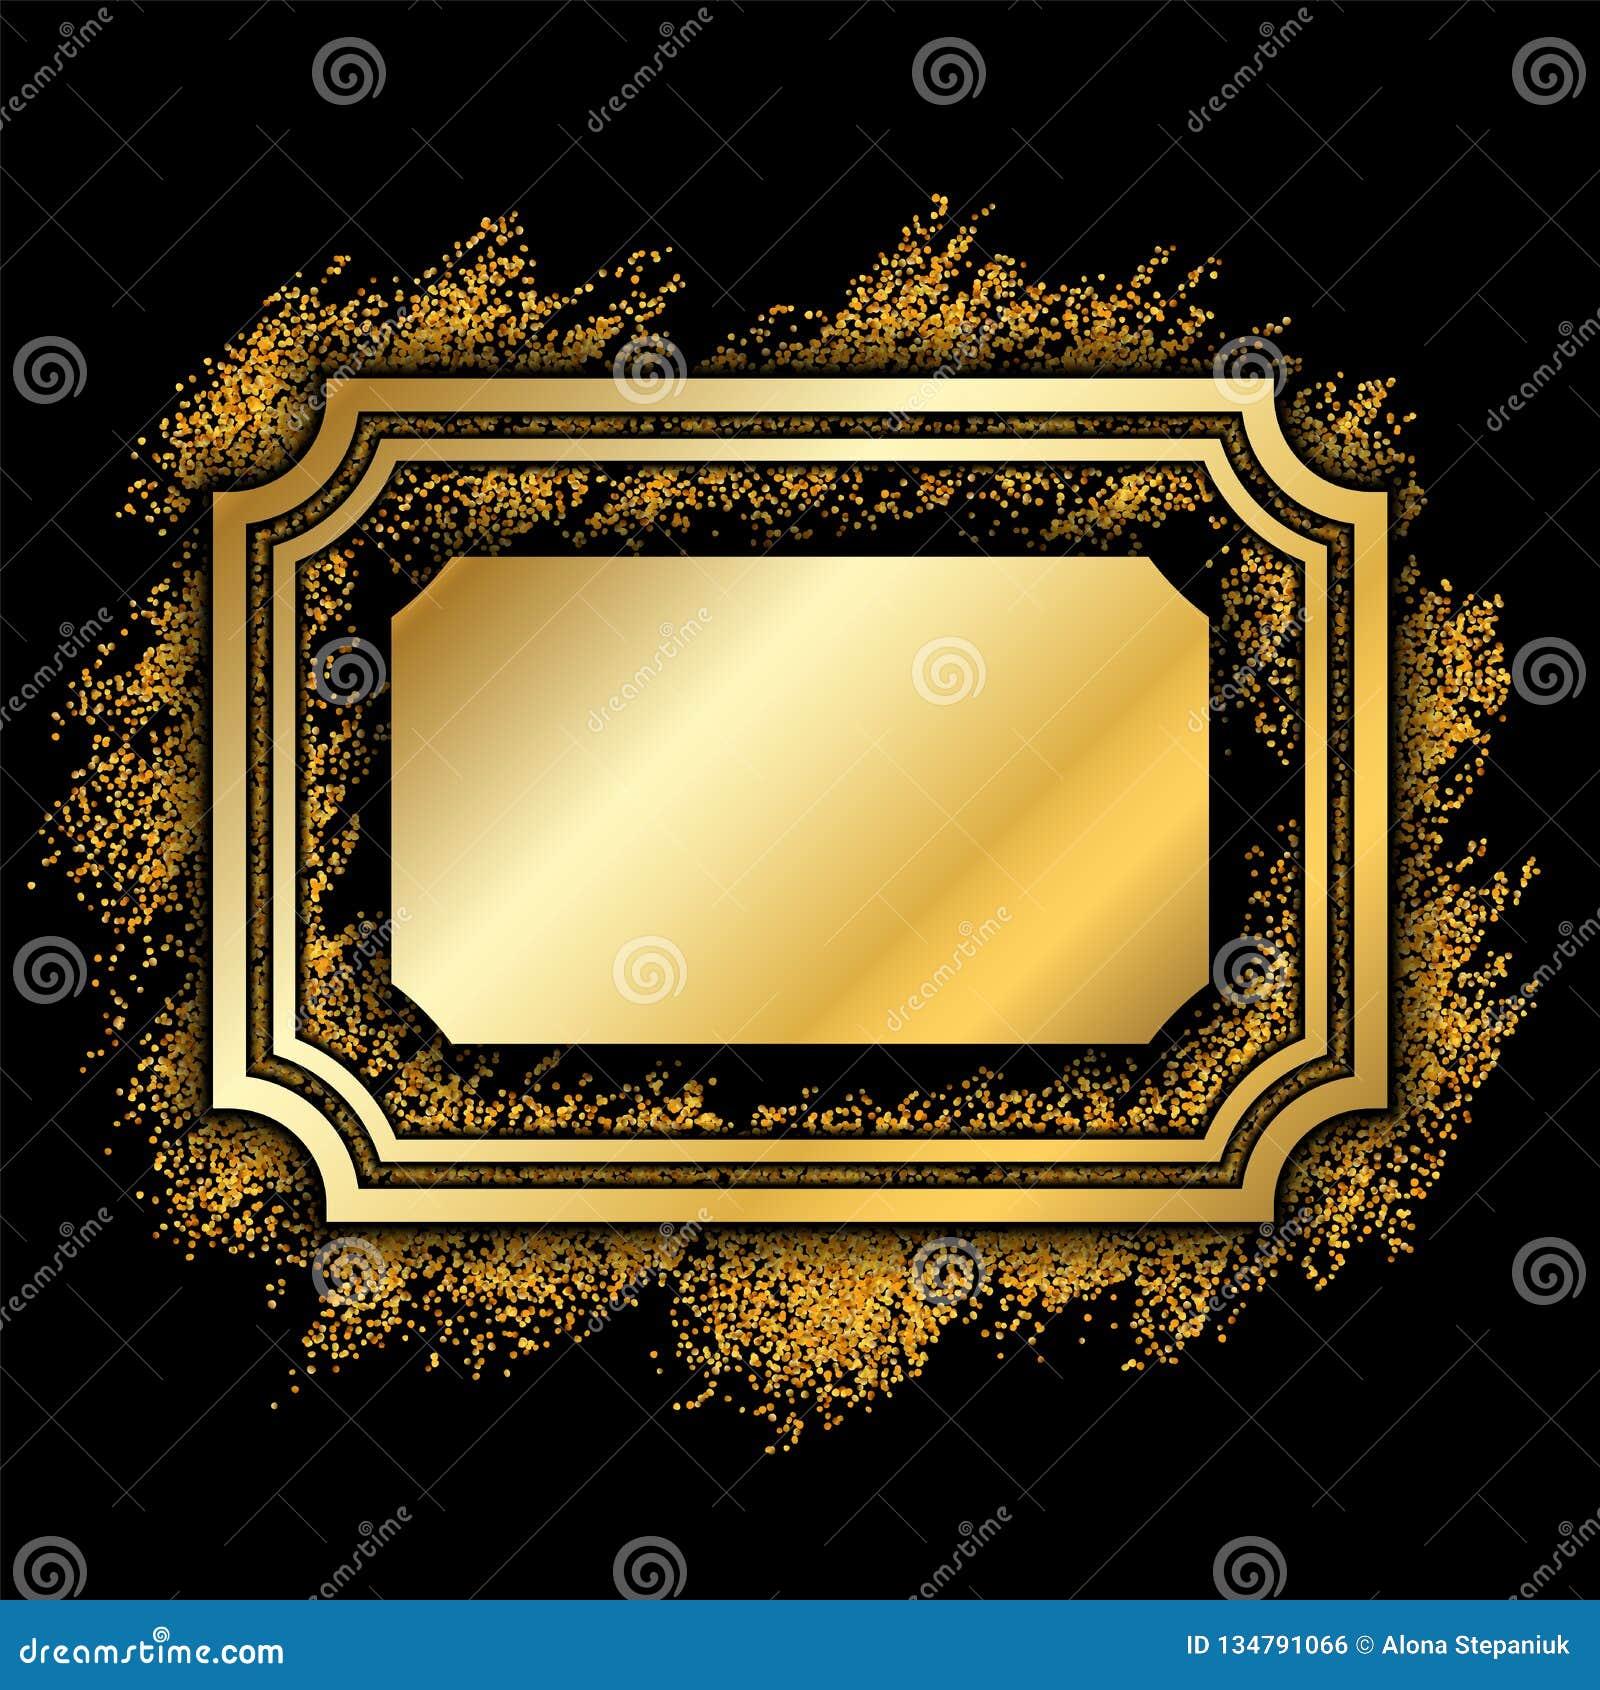 9b2c53c56b84 Gold frame. Beautiful golden glitter design. Vintage style decorative  border